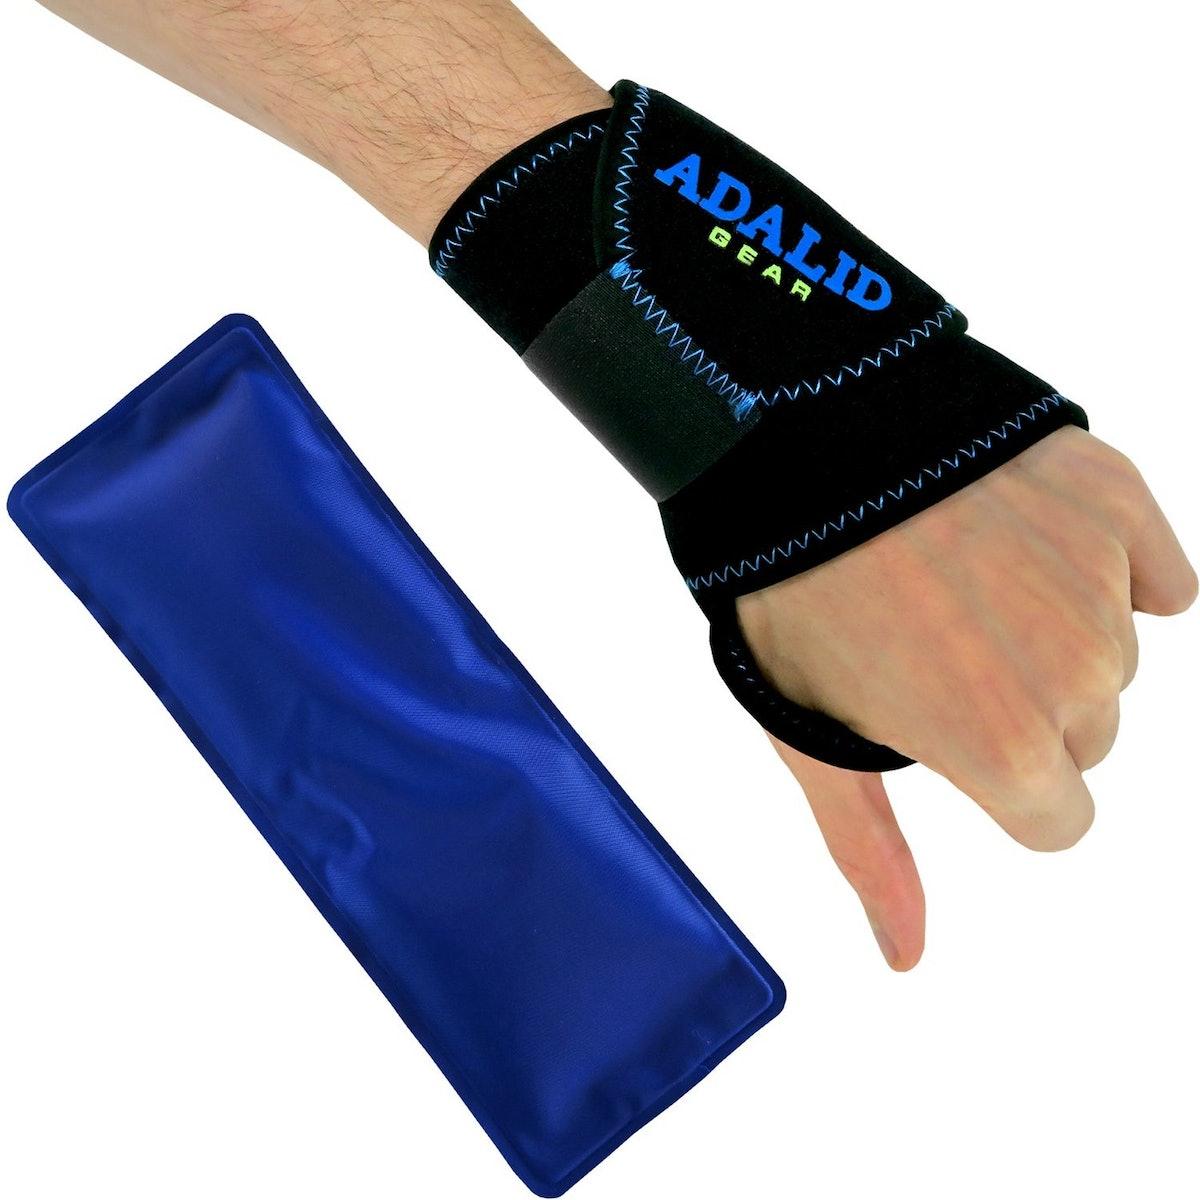 Adalid Gear Wrist Ice Gel Pack with Support Brace